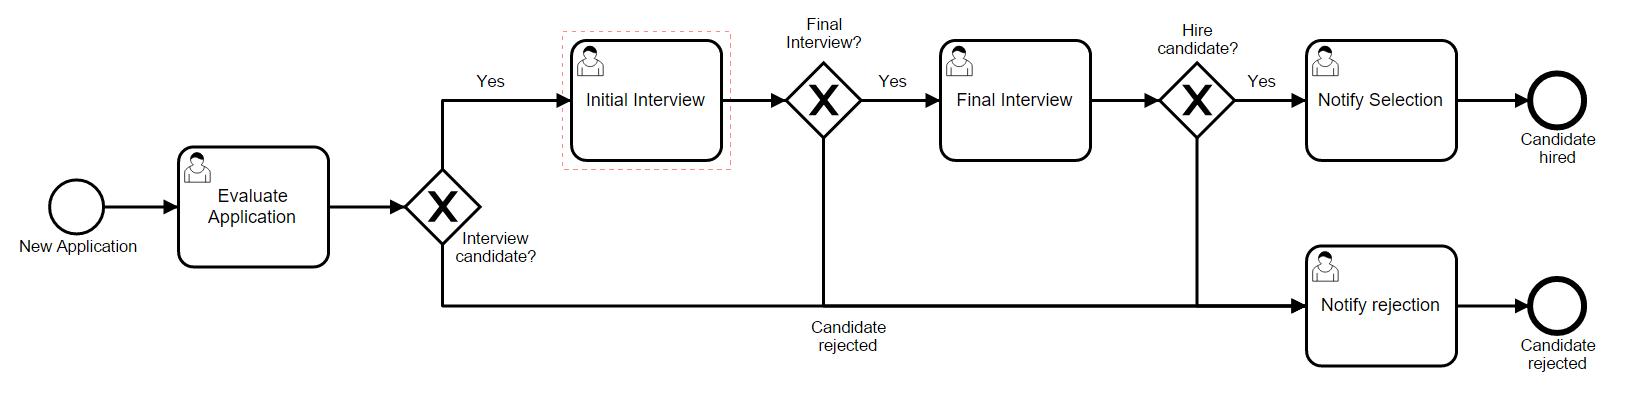 workflow_recruitment